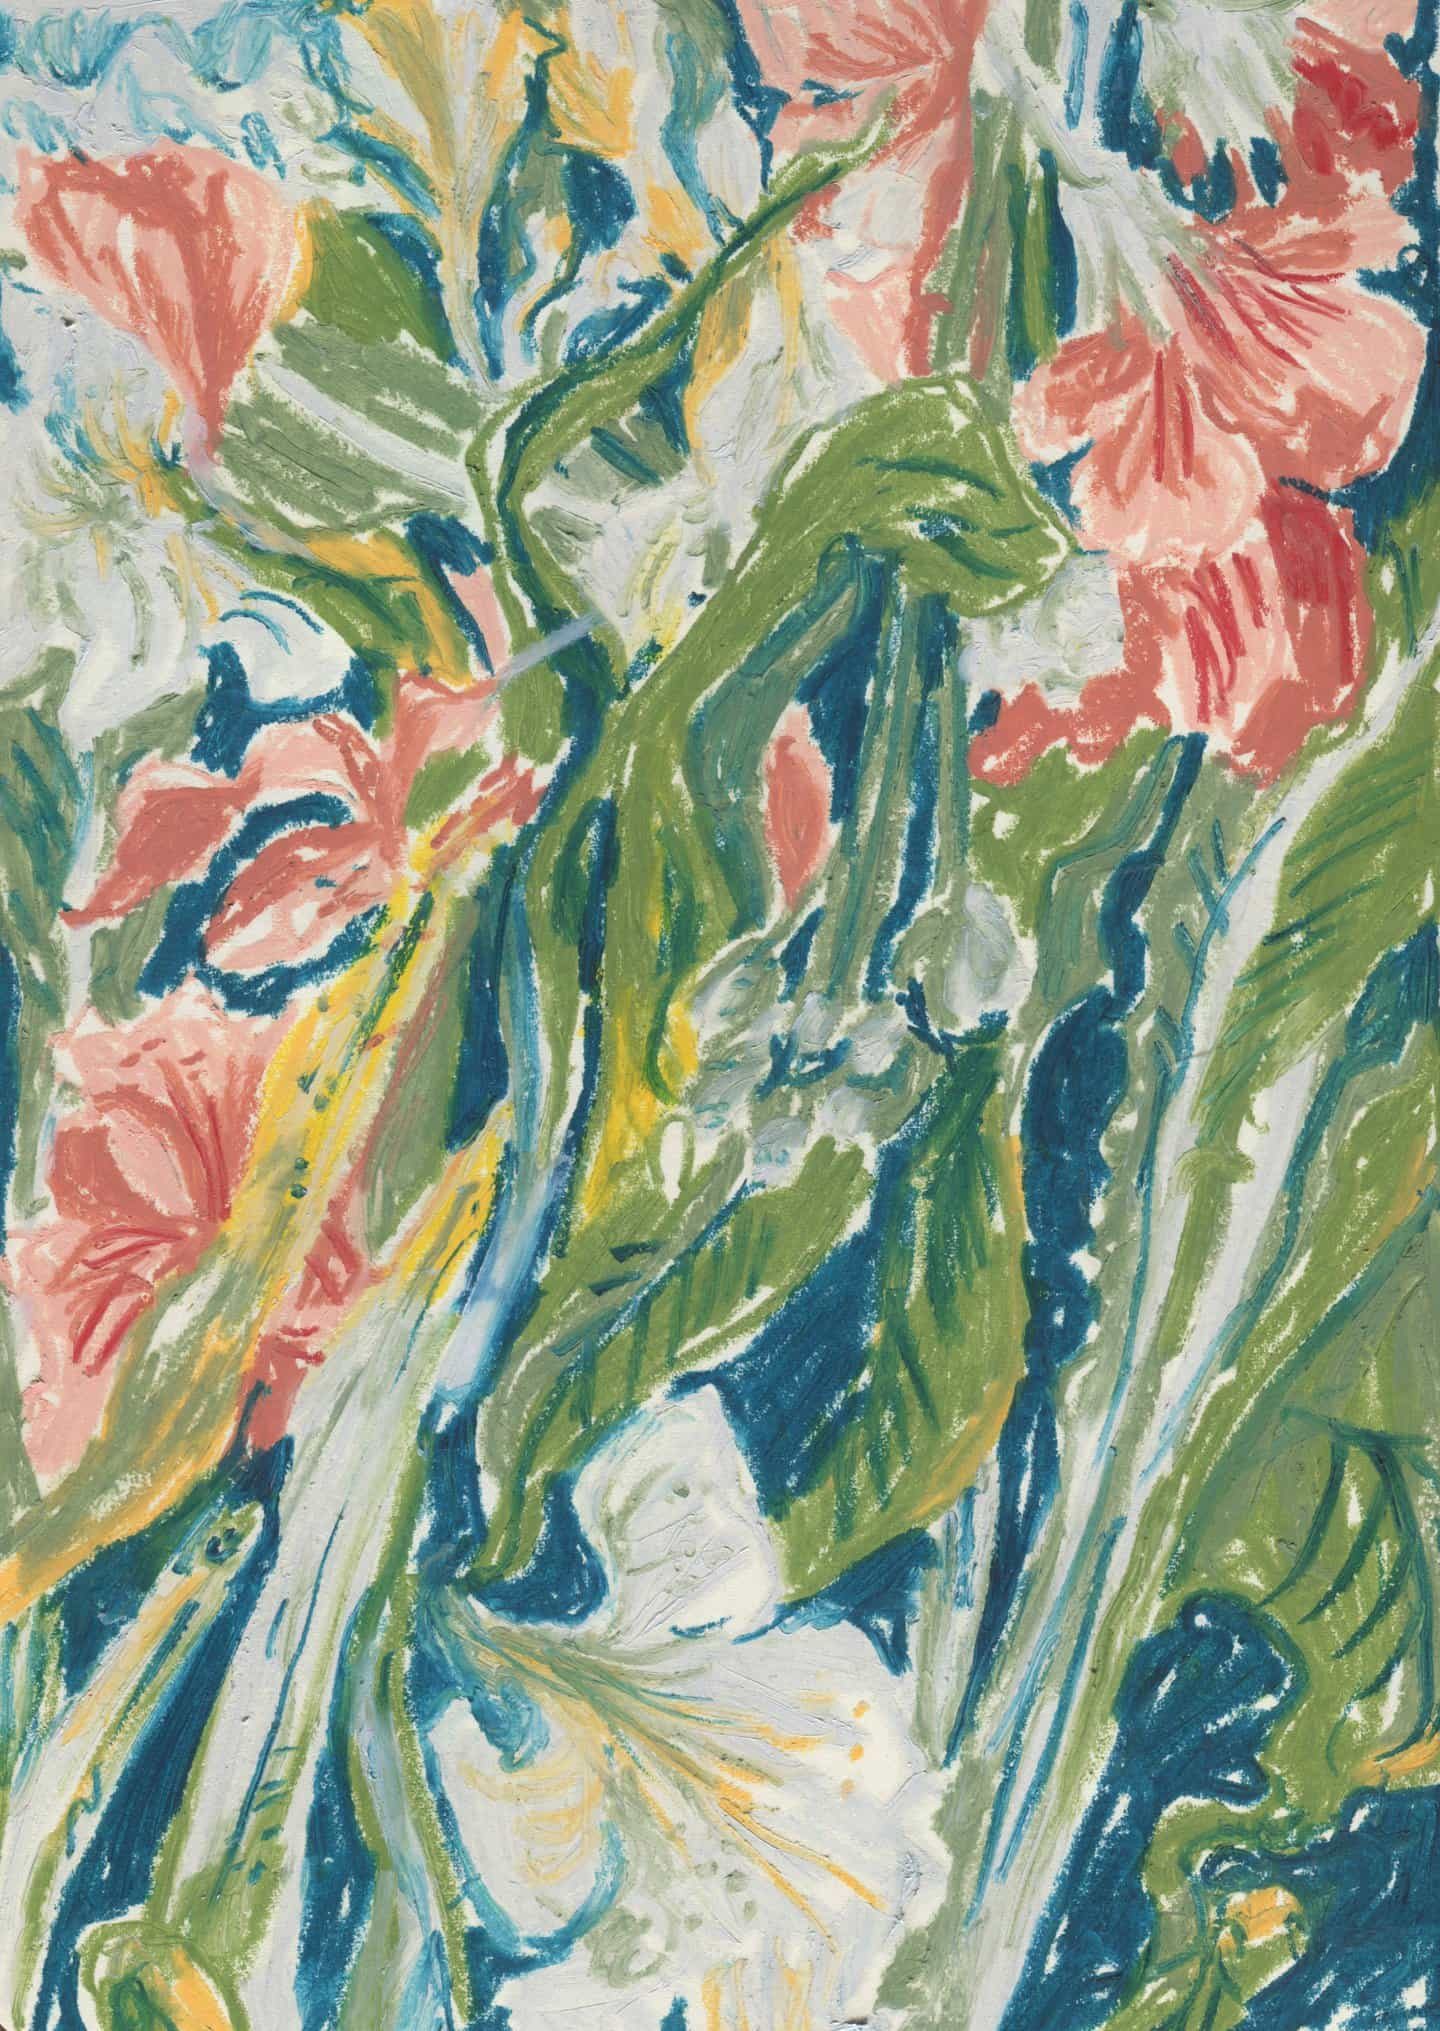 MOLLEY MAYO: Floral 4 (Copyright © Molley May, 2020)